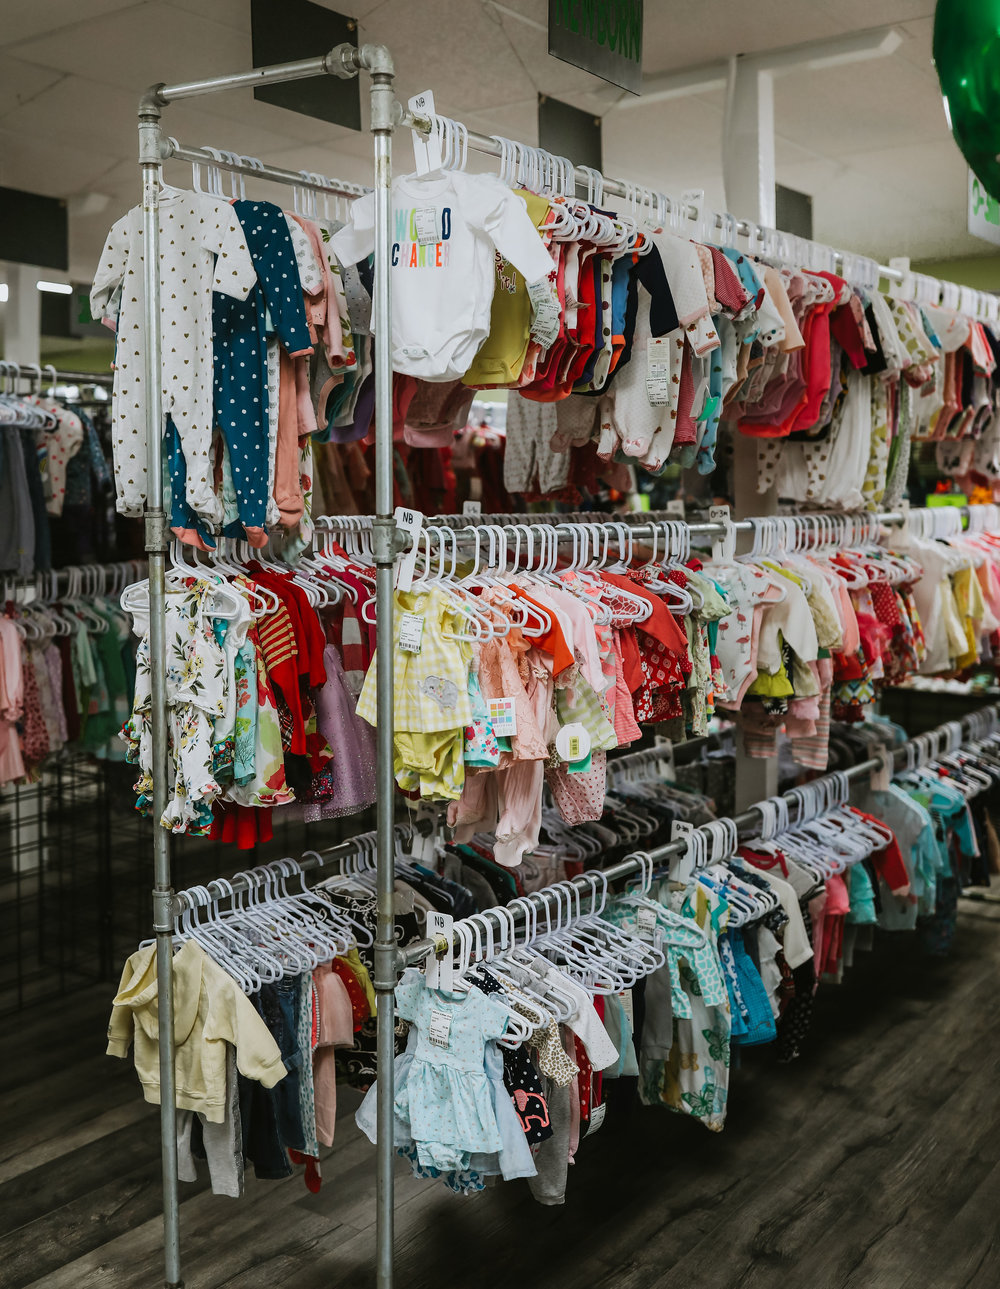 b0e8cc78c55 Sarah s Award Winning Children s Store is all the rave on the Emerald Coast